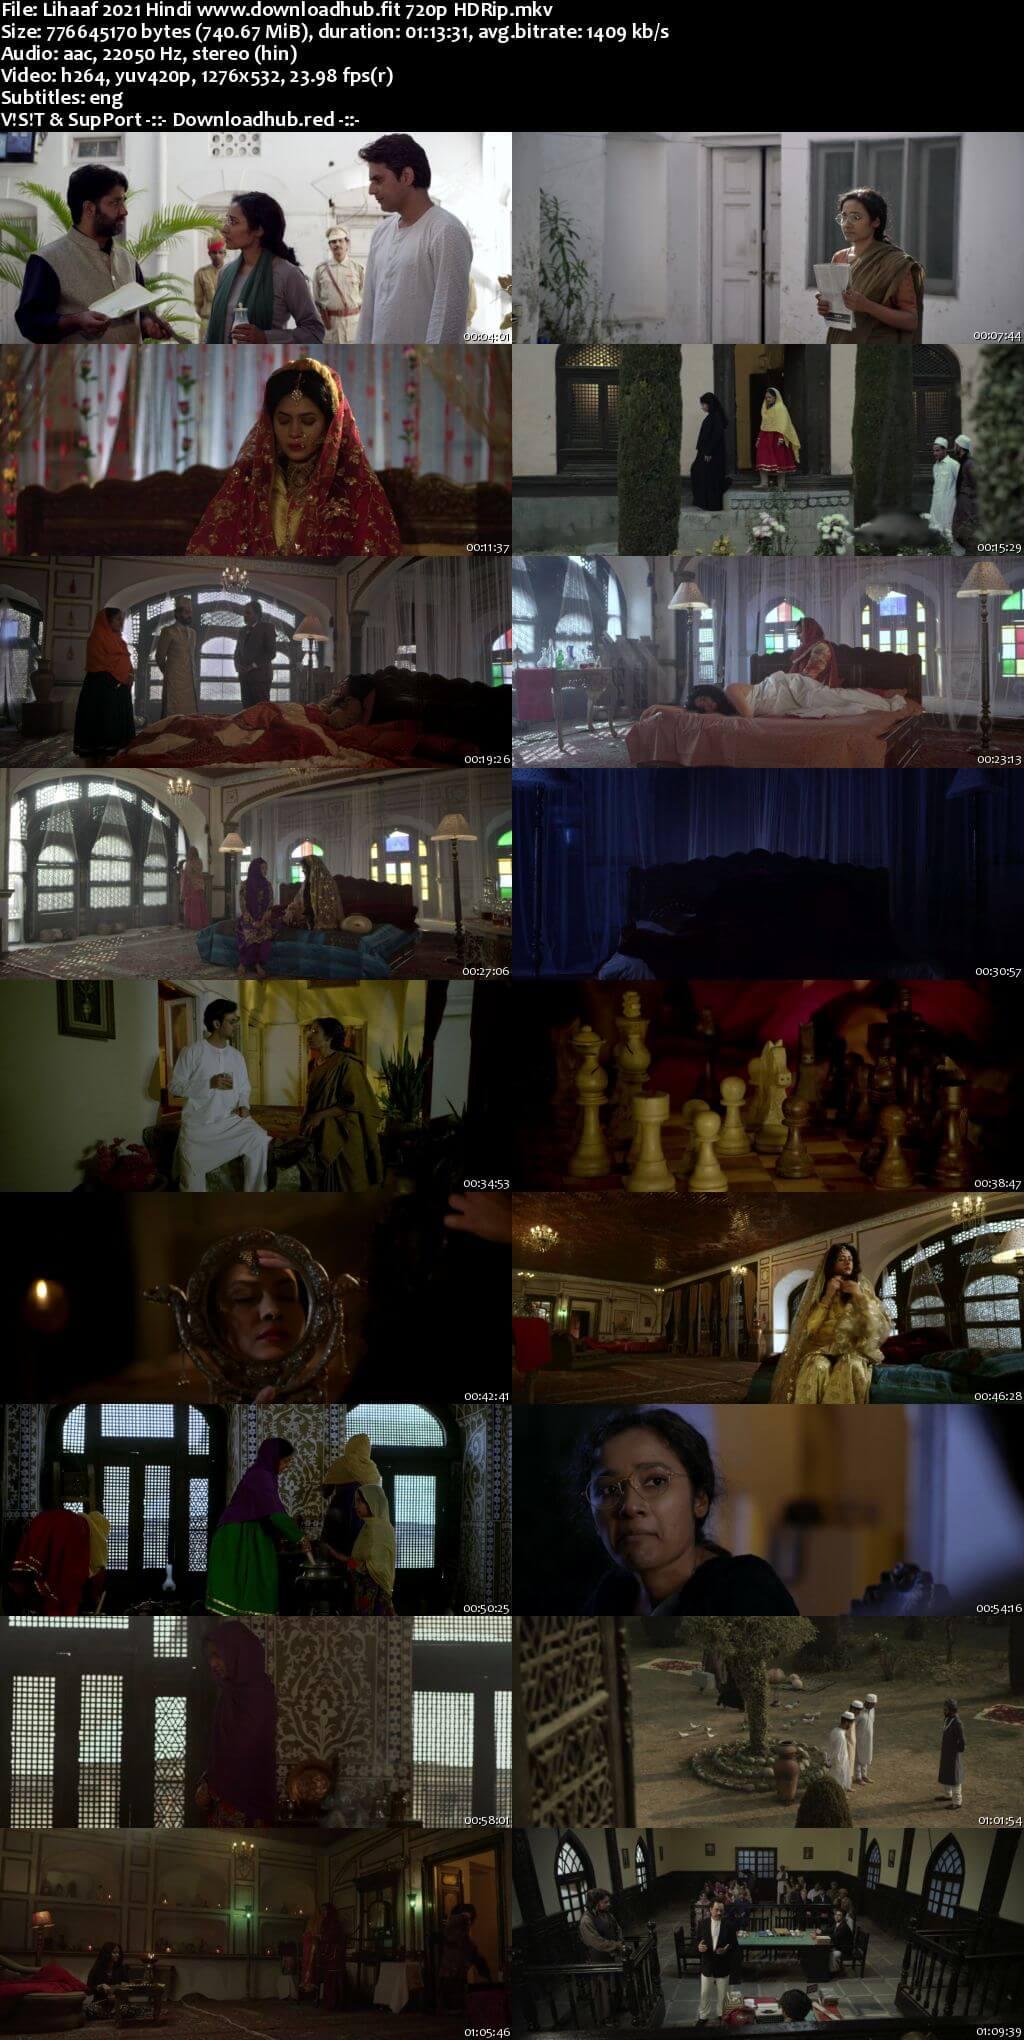 Lihaaf 2021 Hindi 720p HDRip ESubs